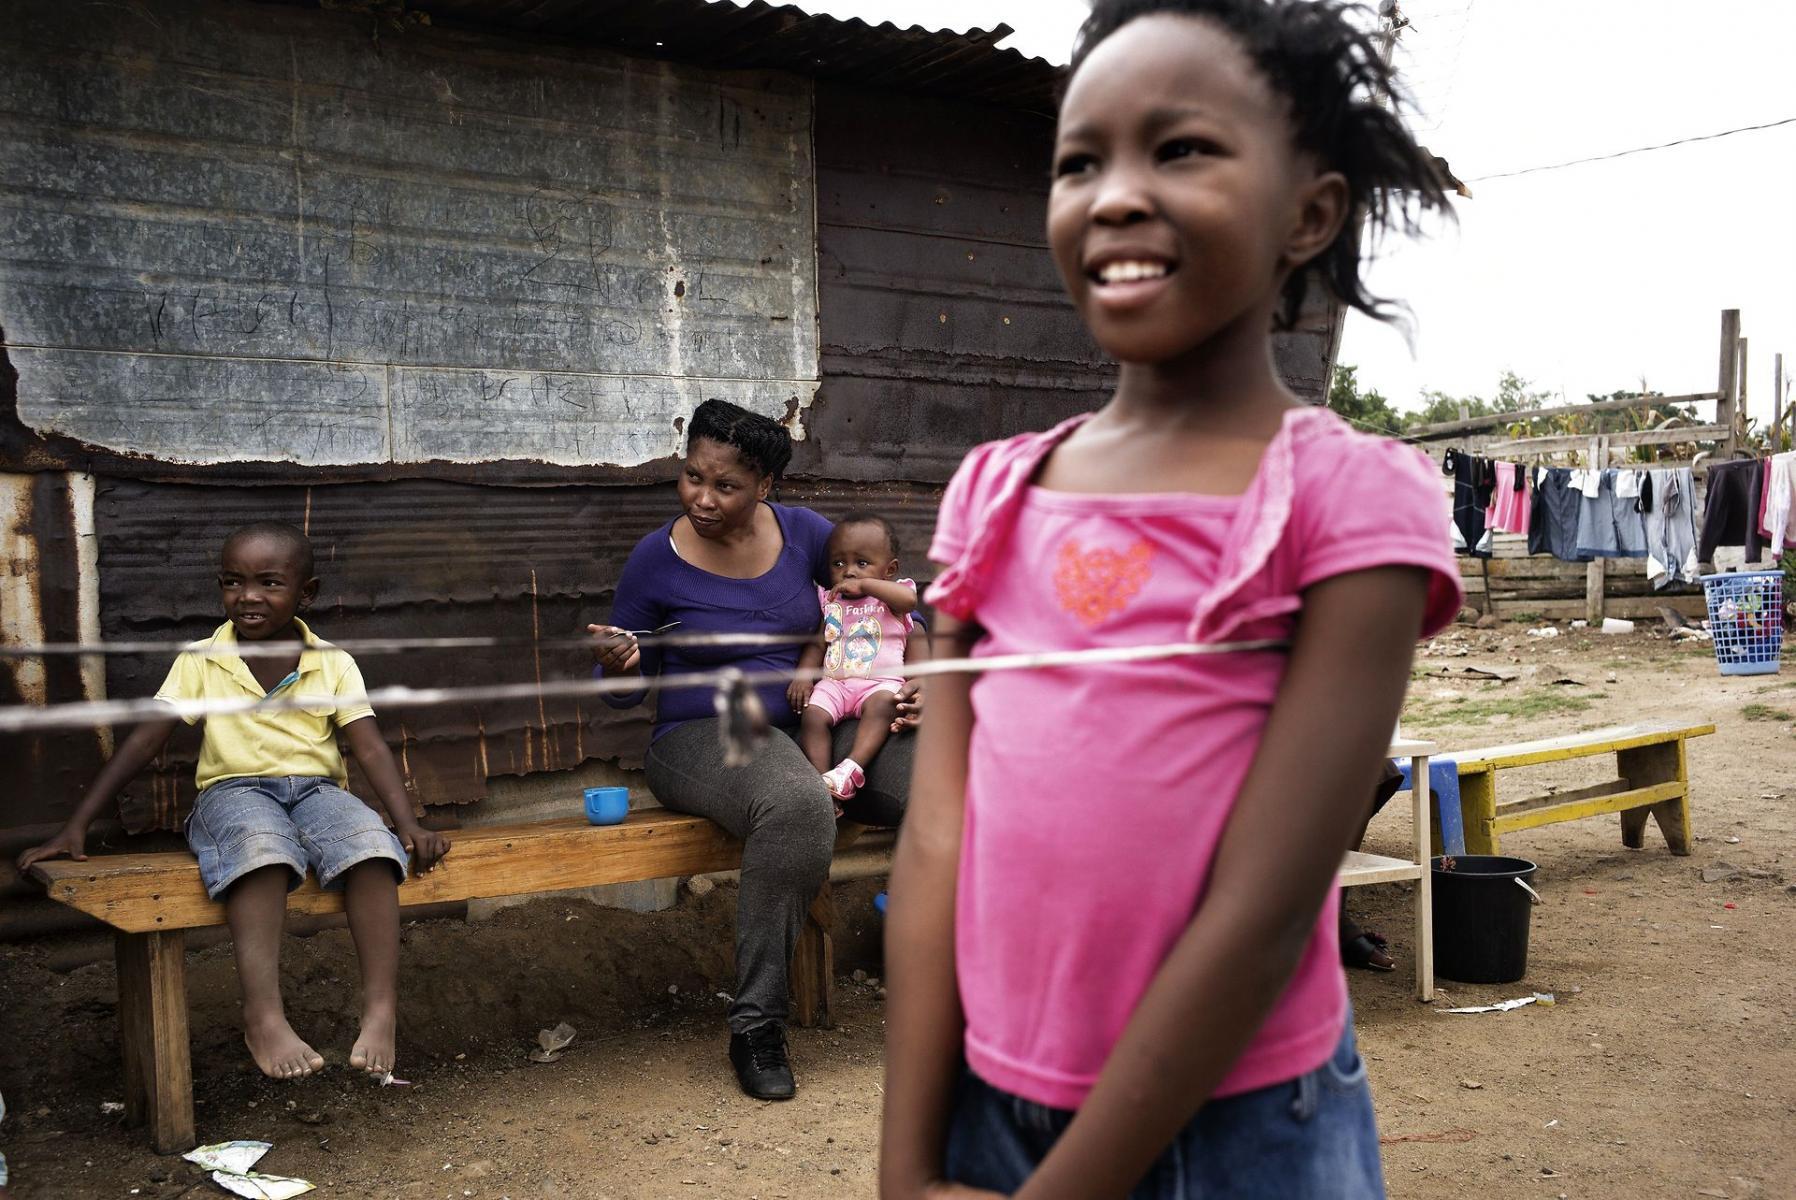 Afrikanske Loveokonomier Faktalink